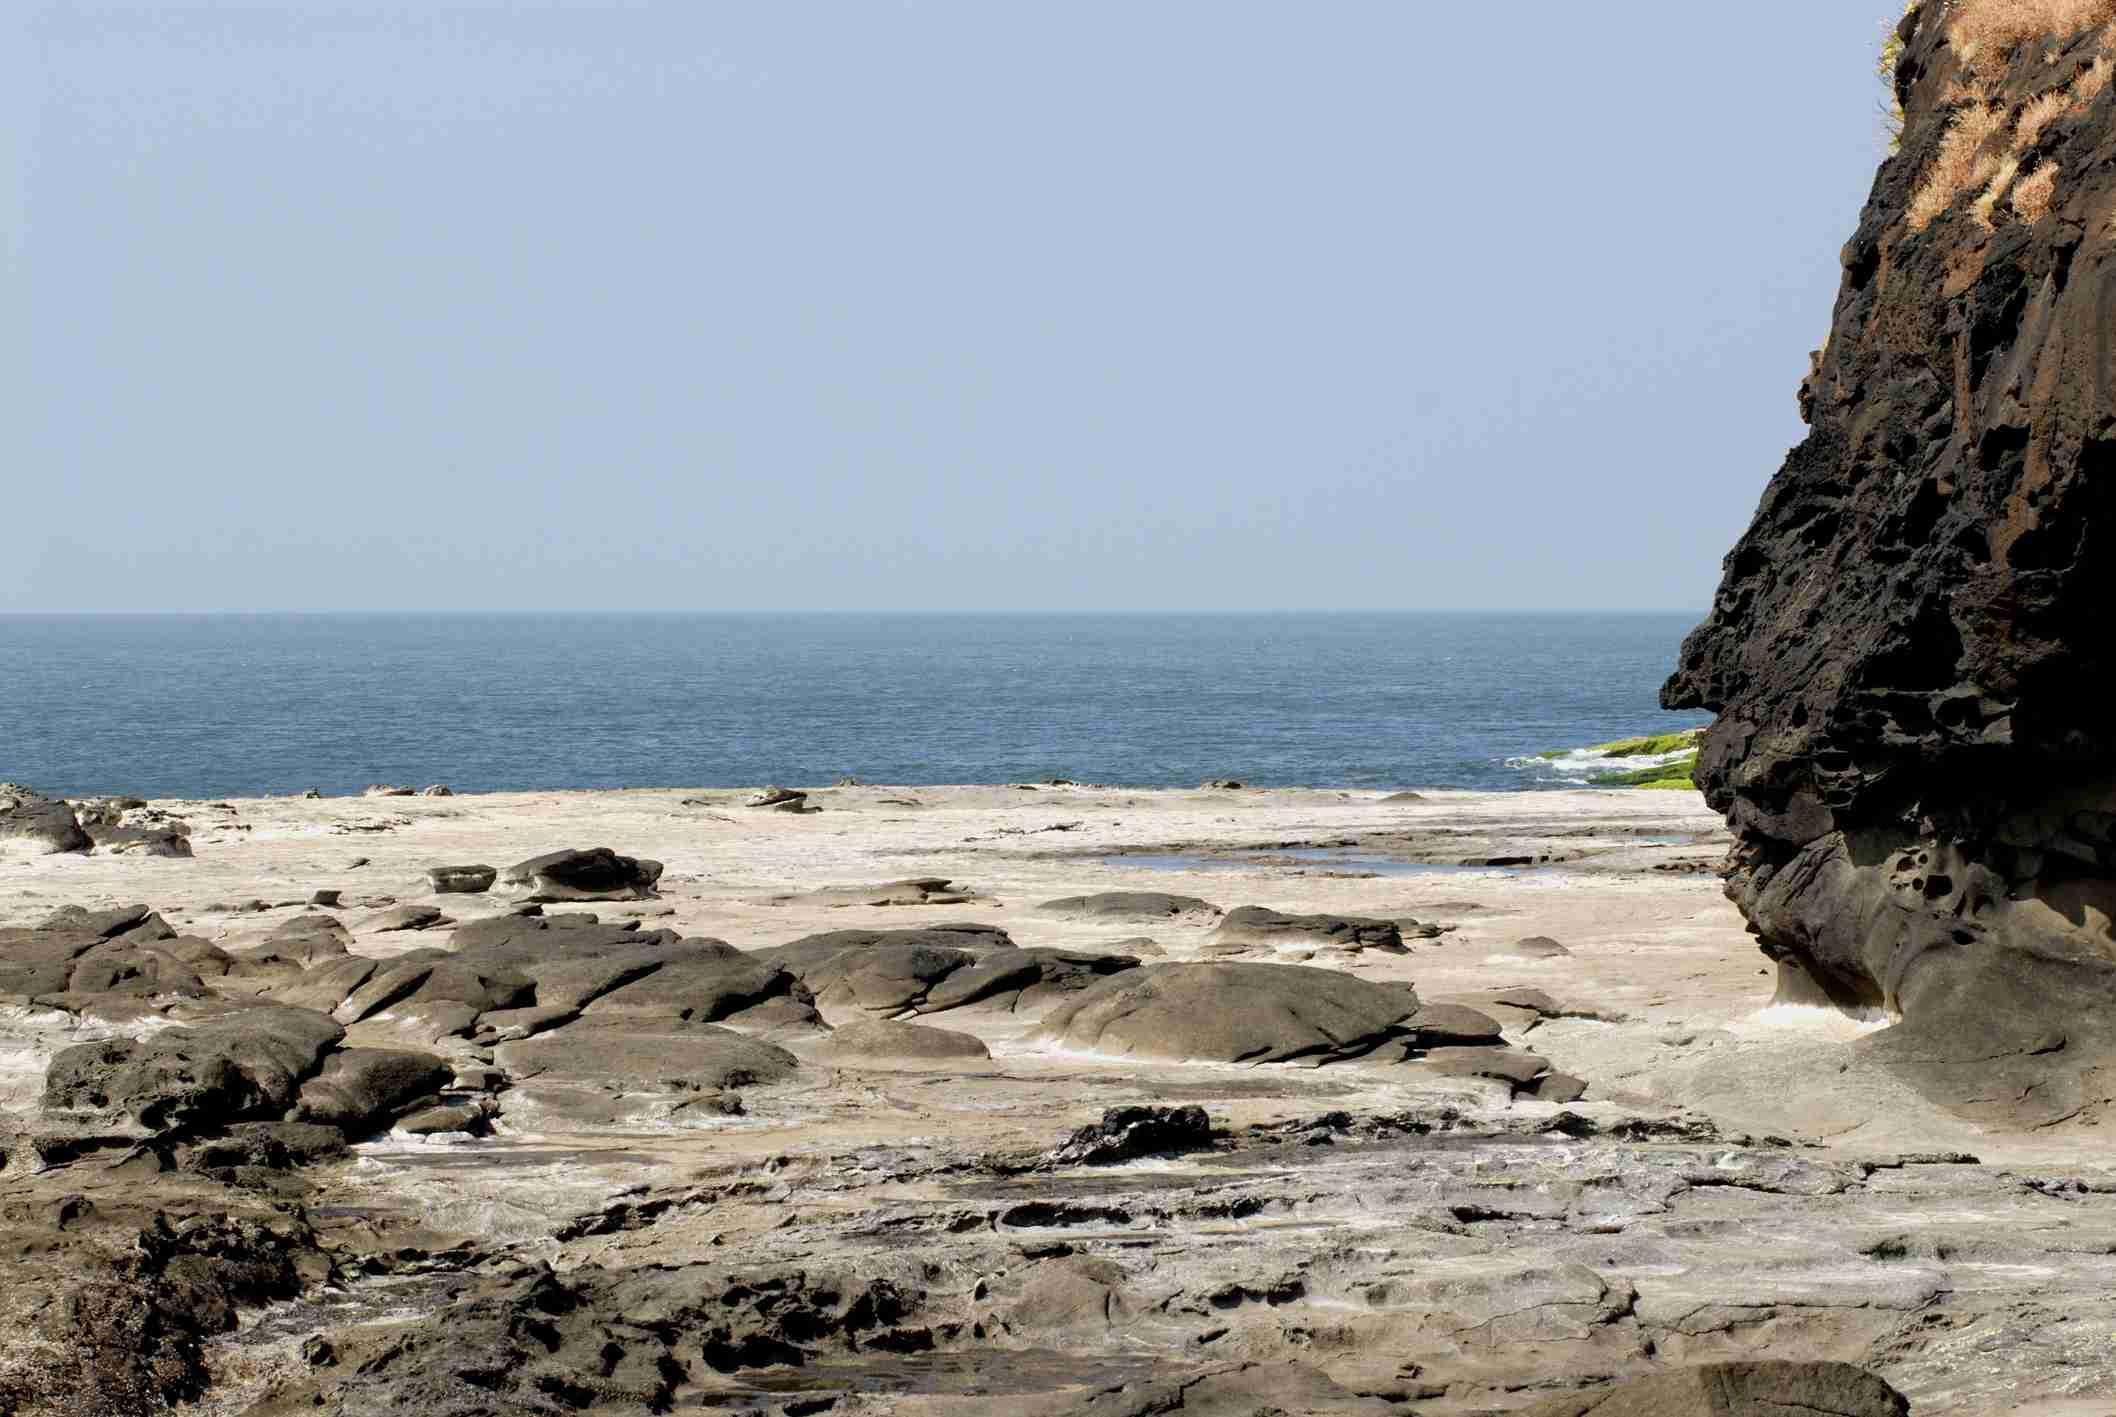 Arabian Sea with Black Rocks Harihareshwar Raigad Maharashtra